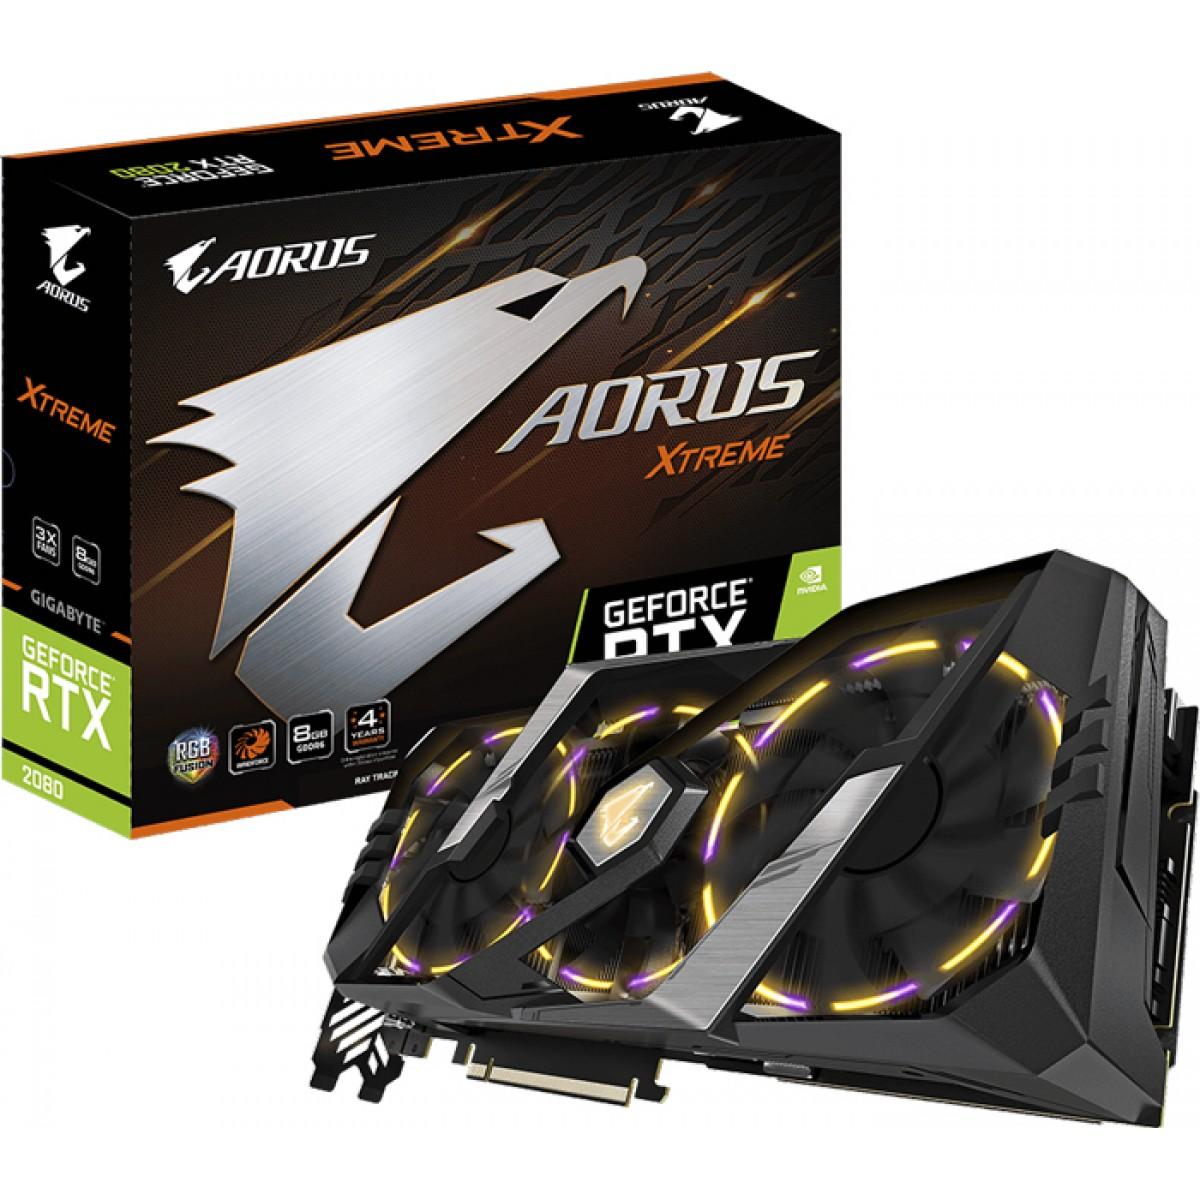 Placa De Vídeo Gigabyte Geforce RTX 2080 Xtreme, 8GB GDDR6, 256Bit